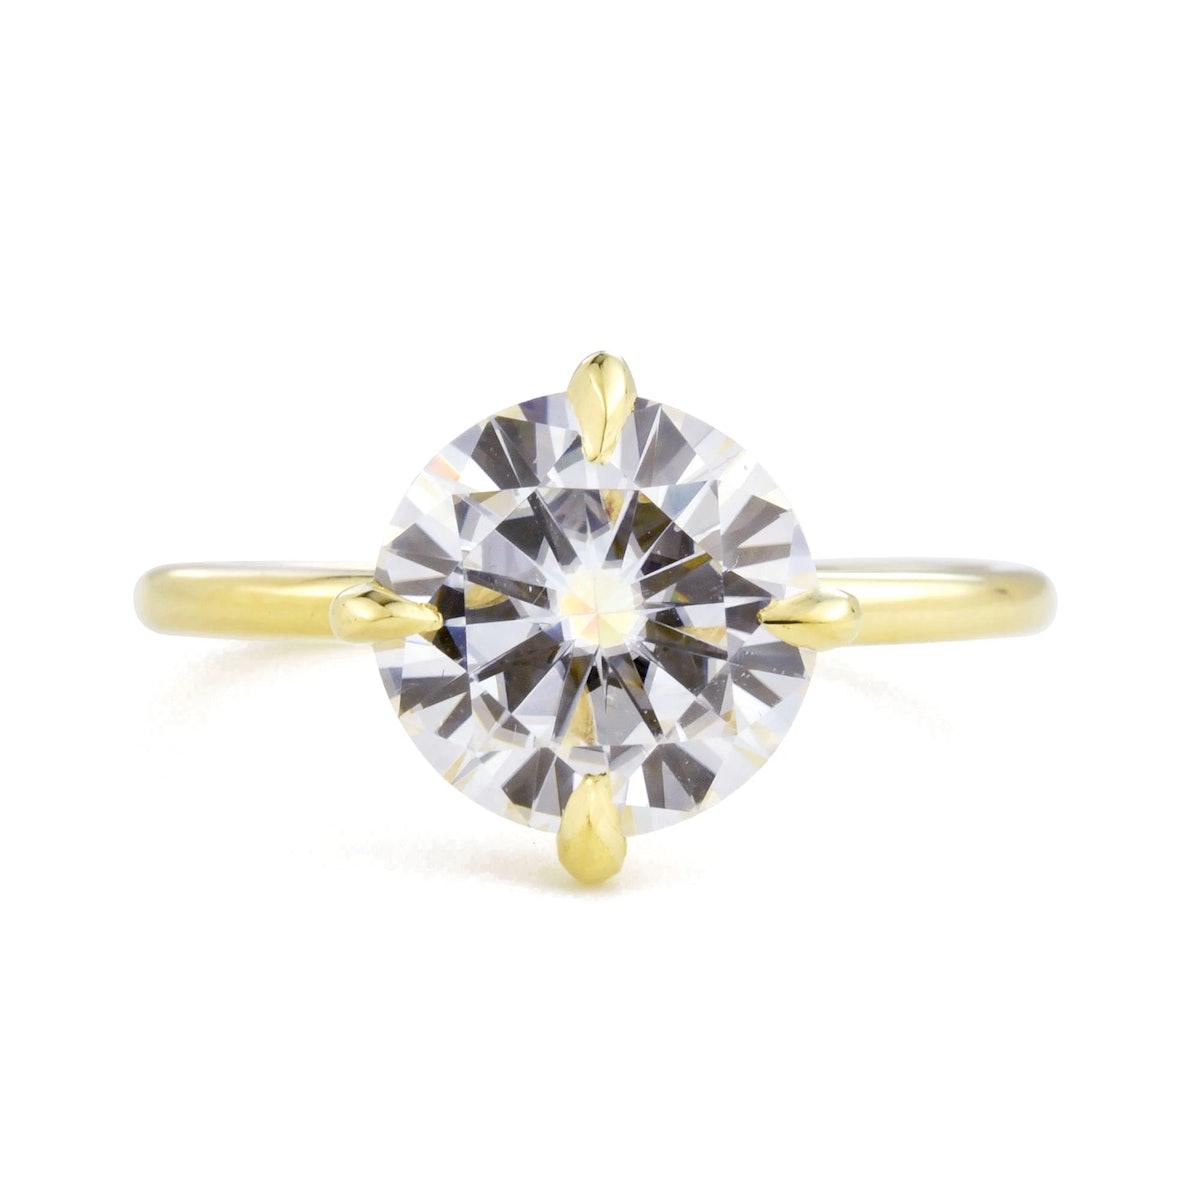 Valerie Madison Vera 2ct Diamond Solitaire Engagement Ring